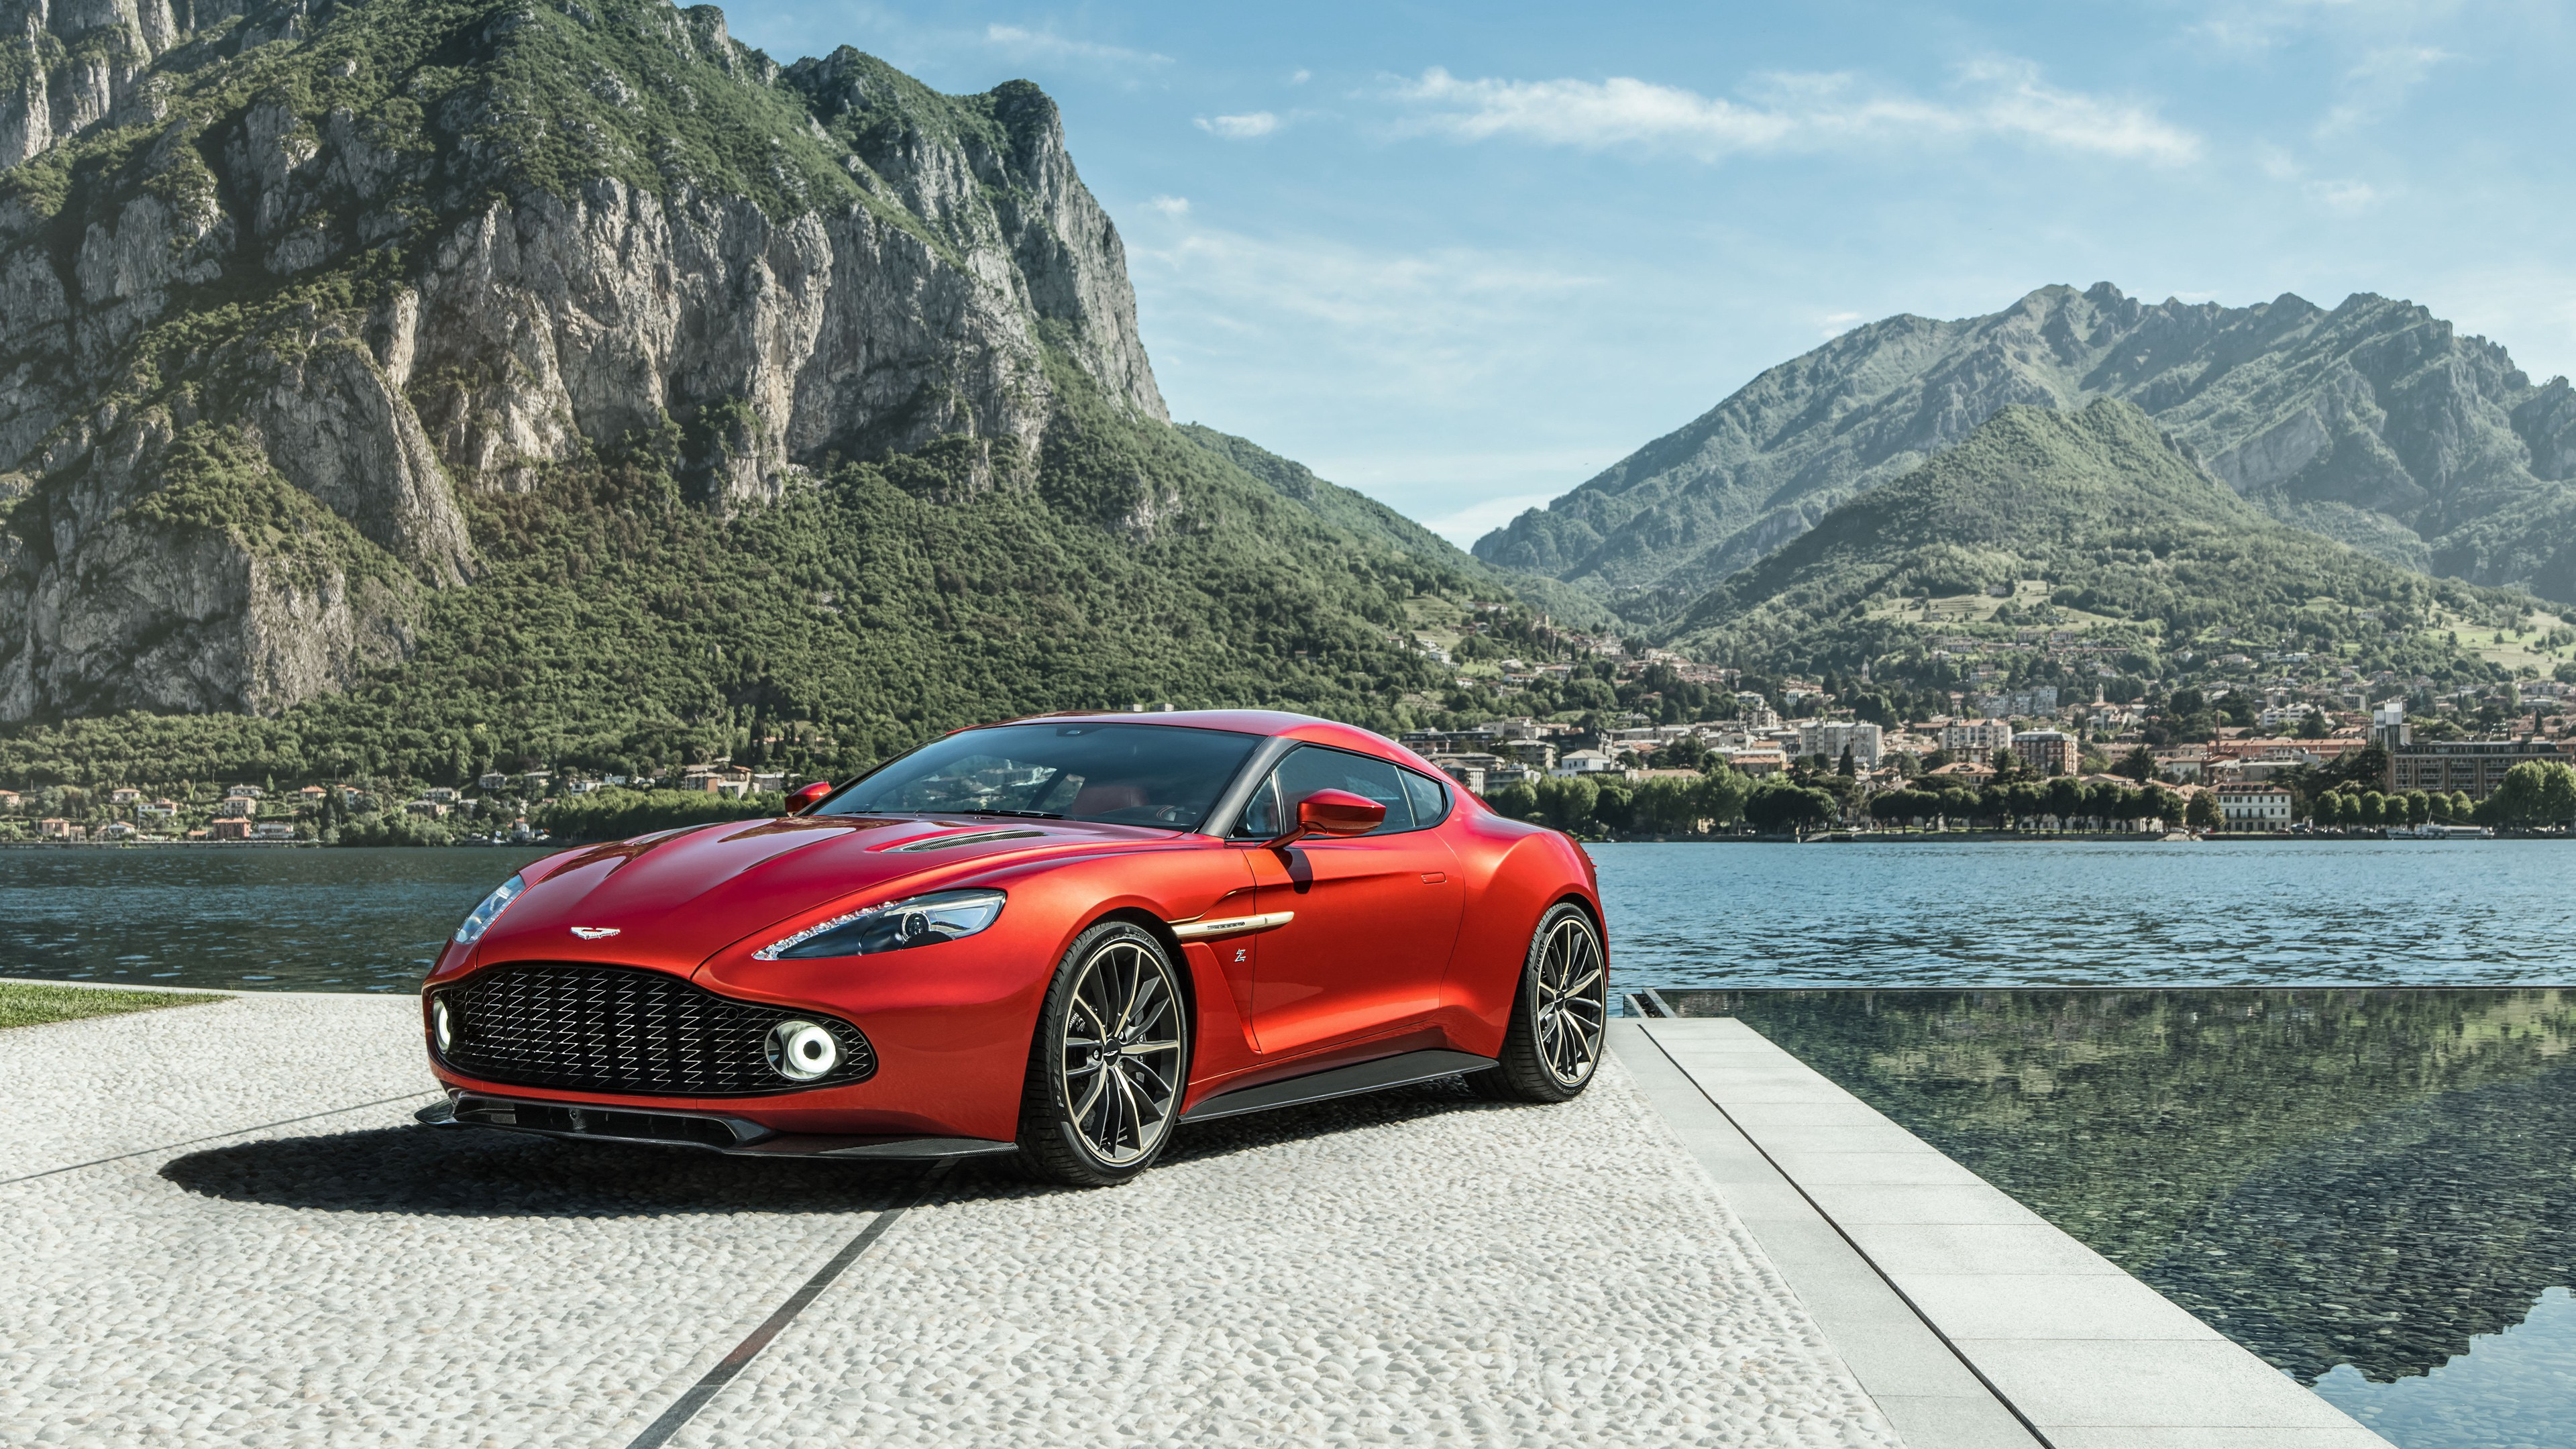 2017 Aston Martin Vanquish Zagato 5 Wallpaper | HD Car ...